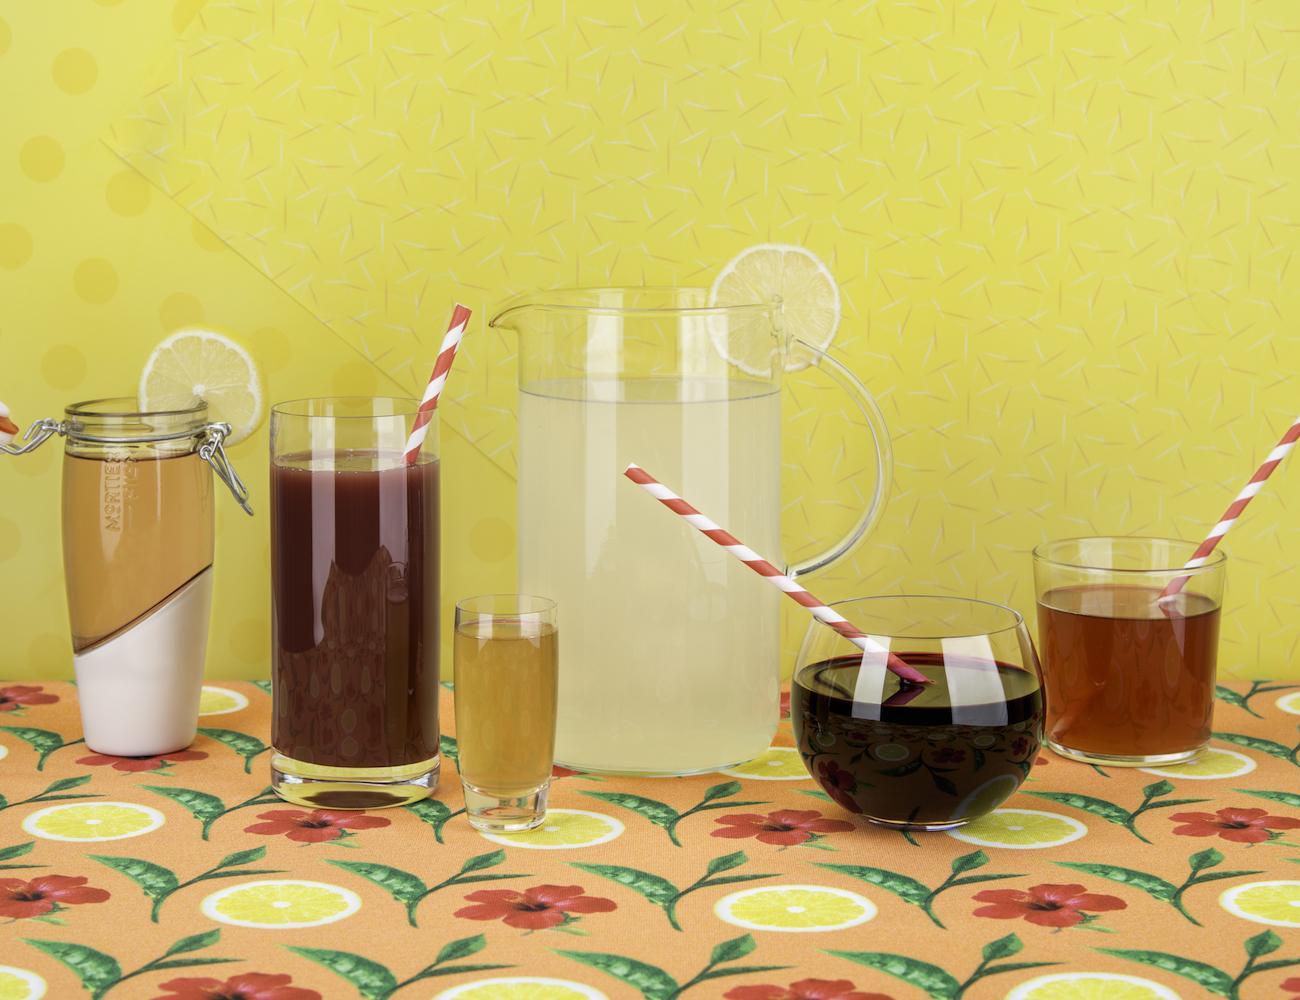 Kombucha Brewing Jar by Mortier Pilon